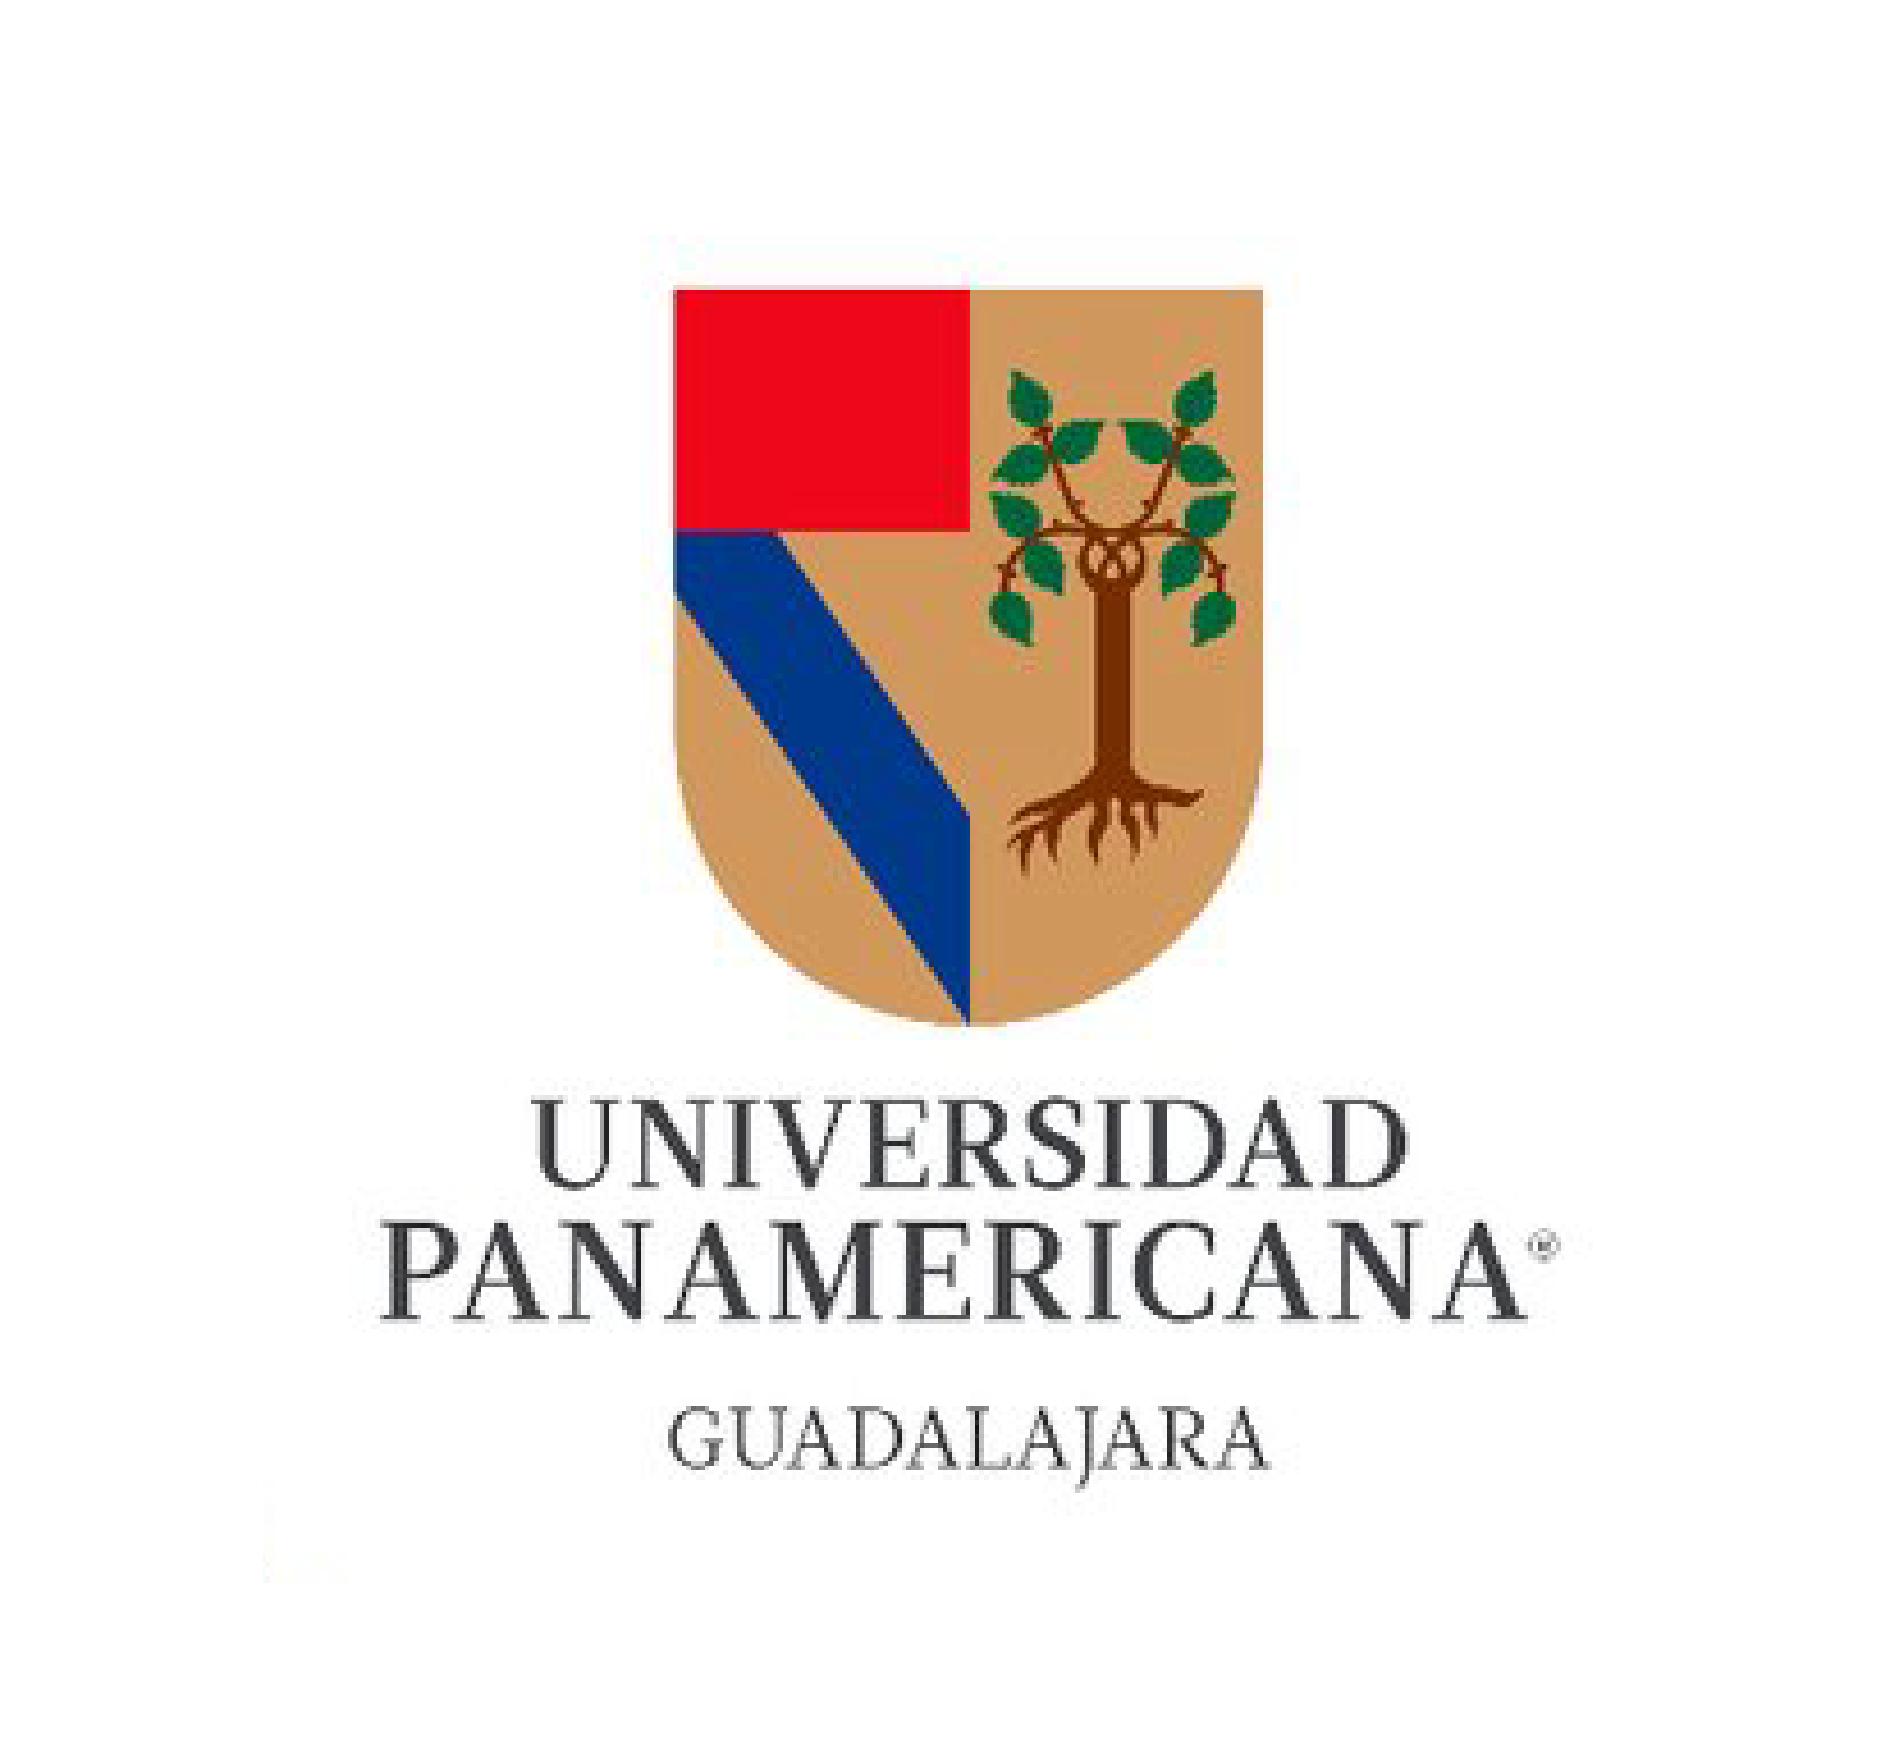 Universidad Panamericana